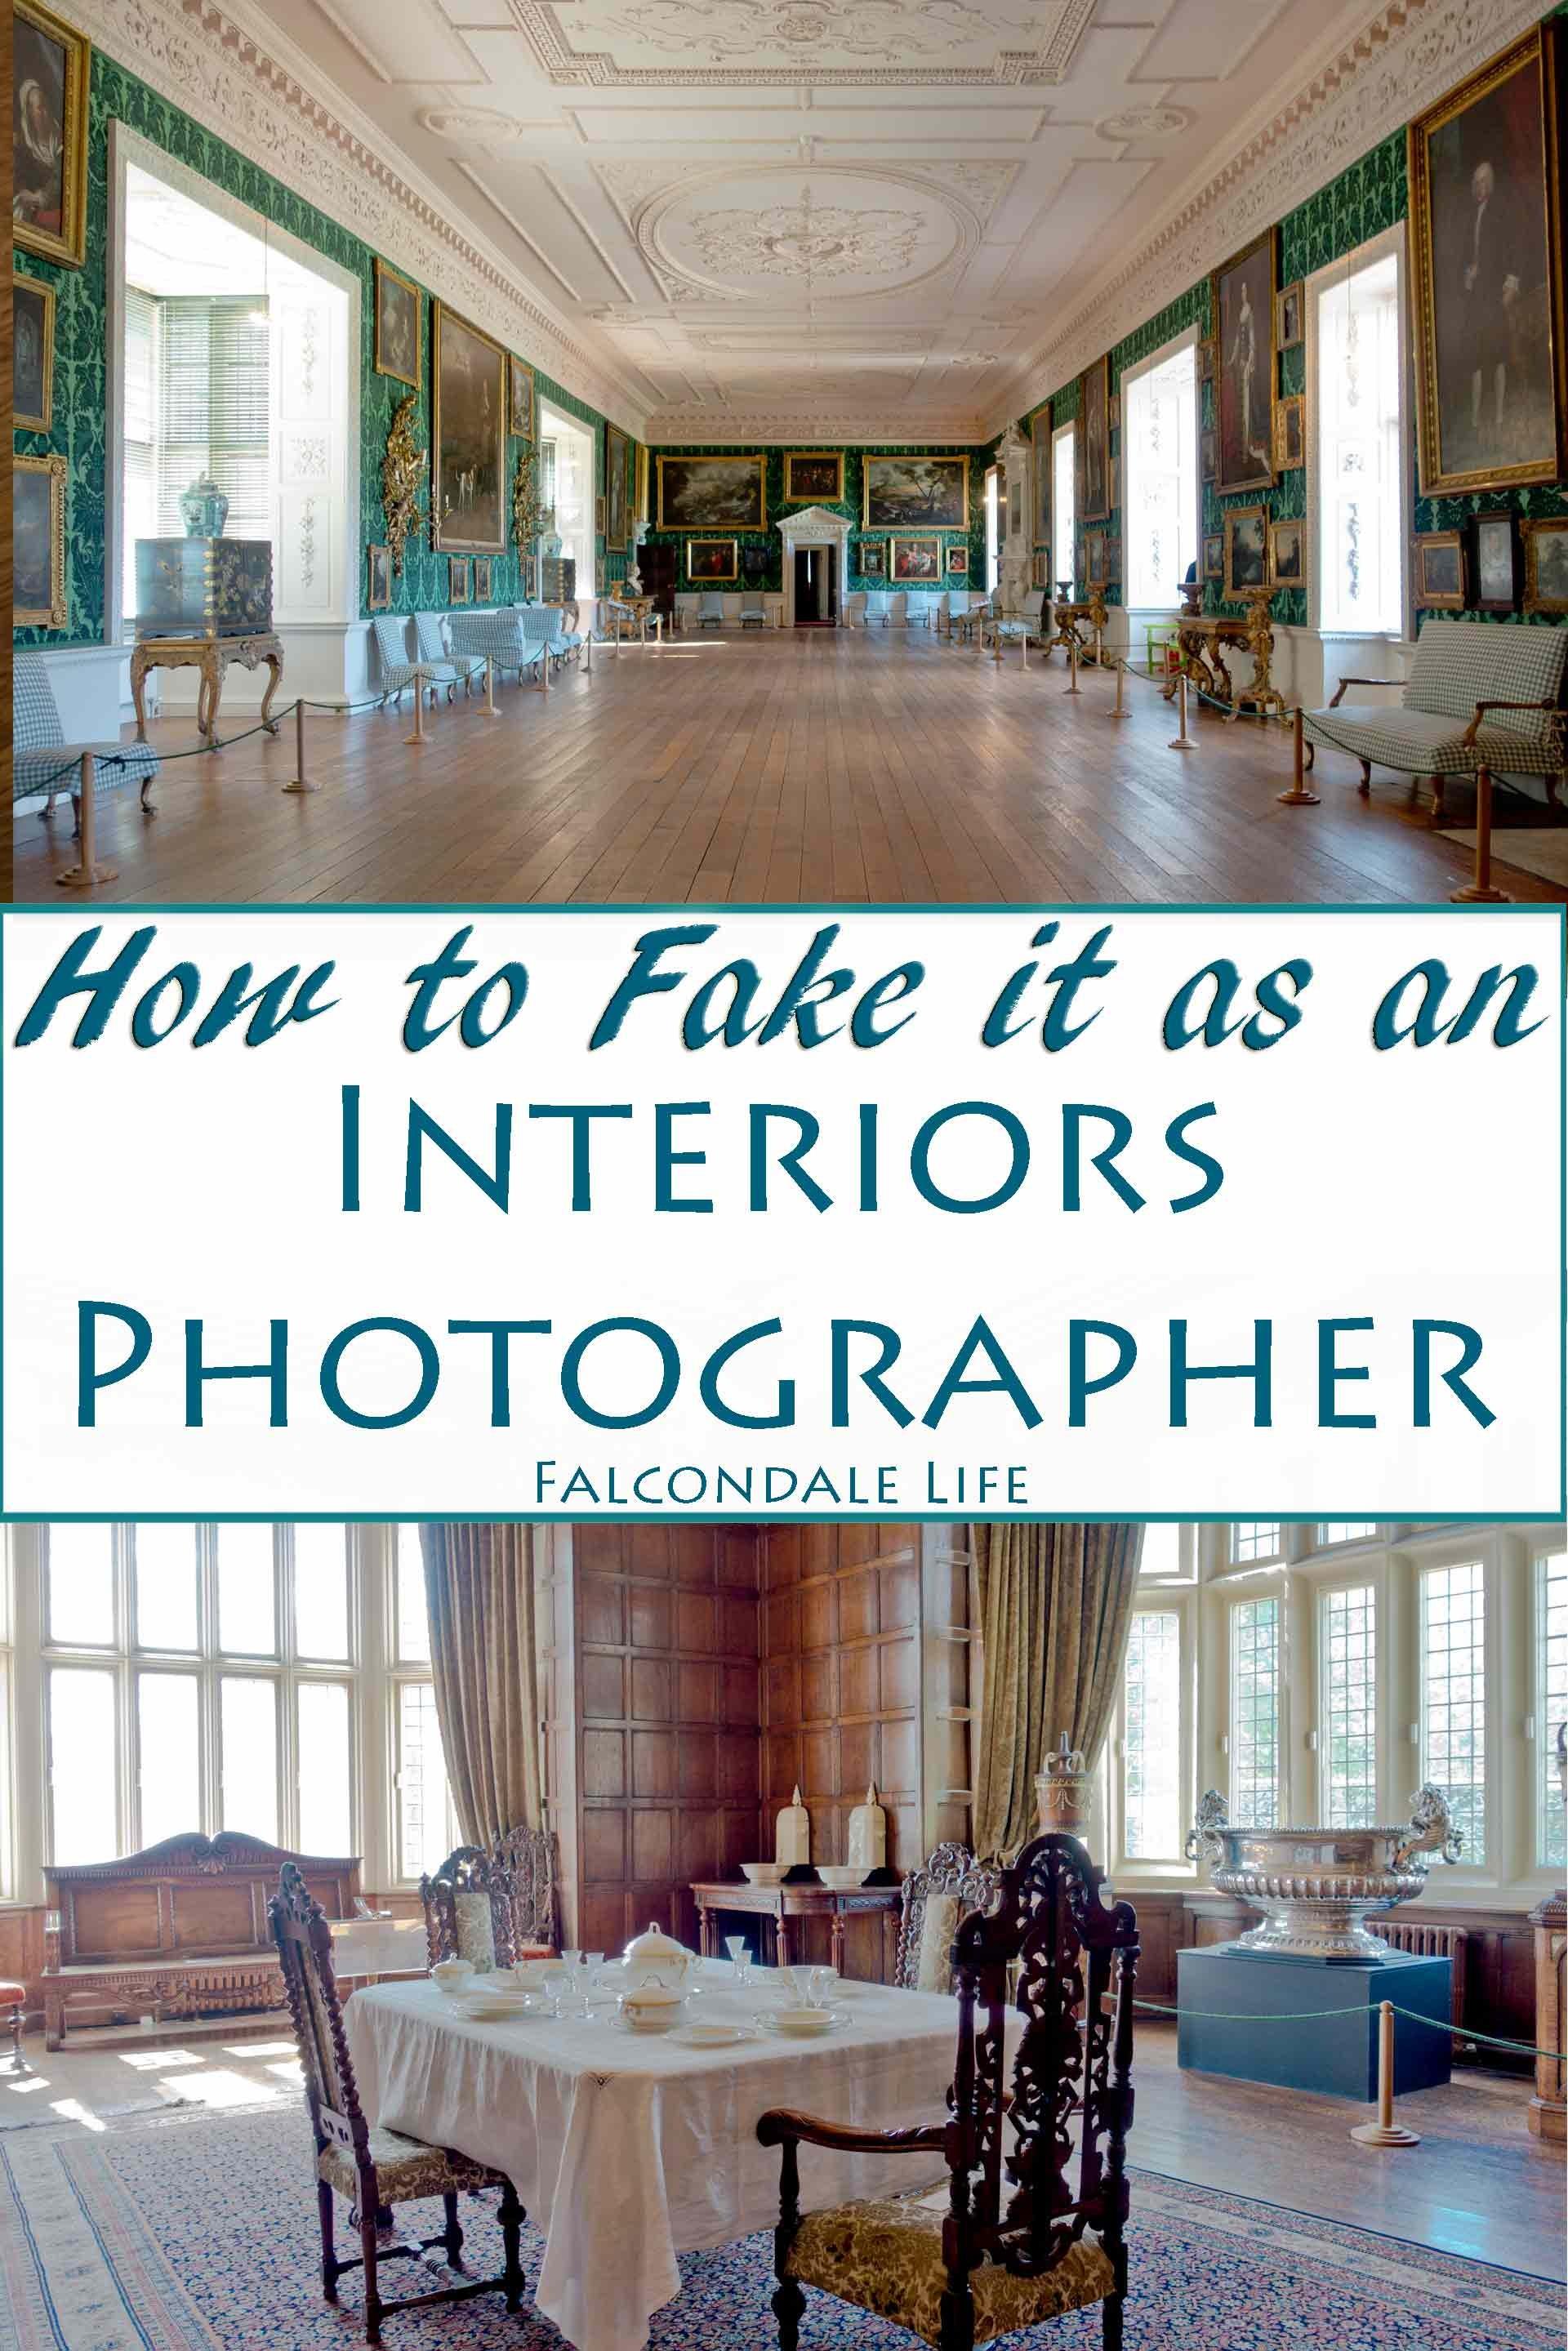 interiors faking it - photo #6